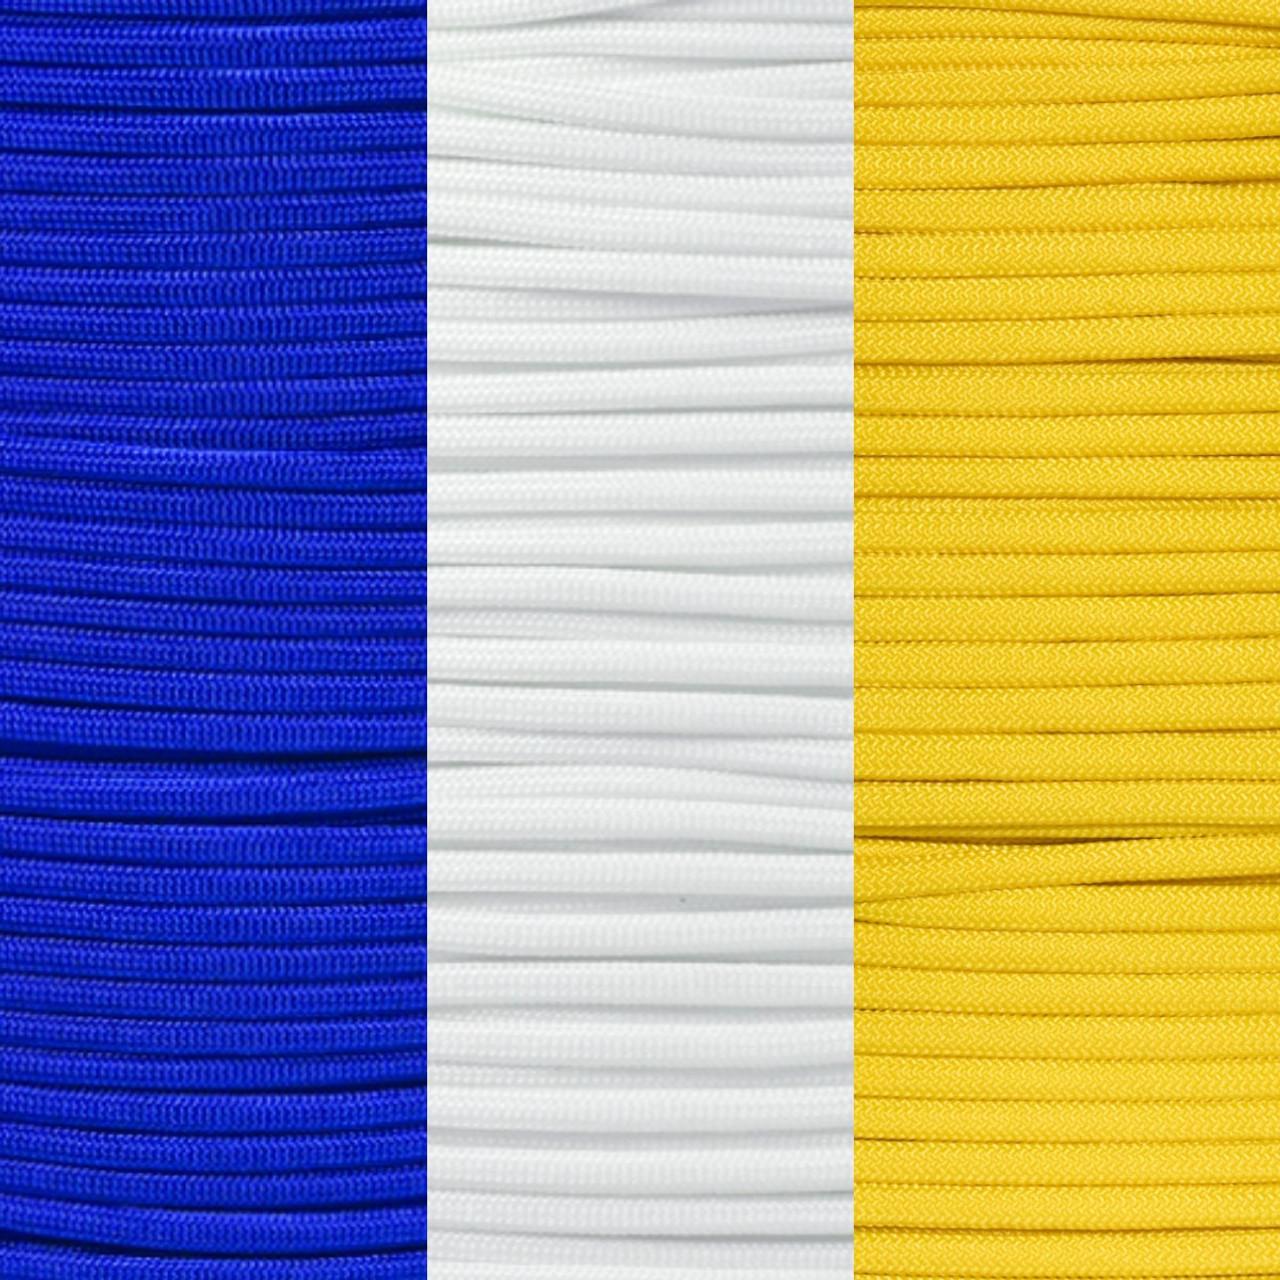 lowest price 642d9 4dbcc Los Angeles Rams Fan Colors Paracord Kits